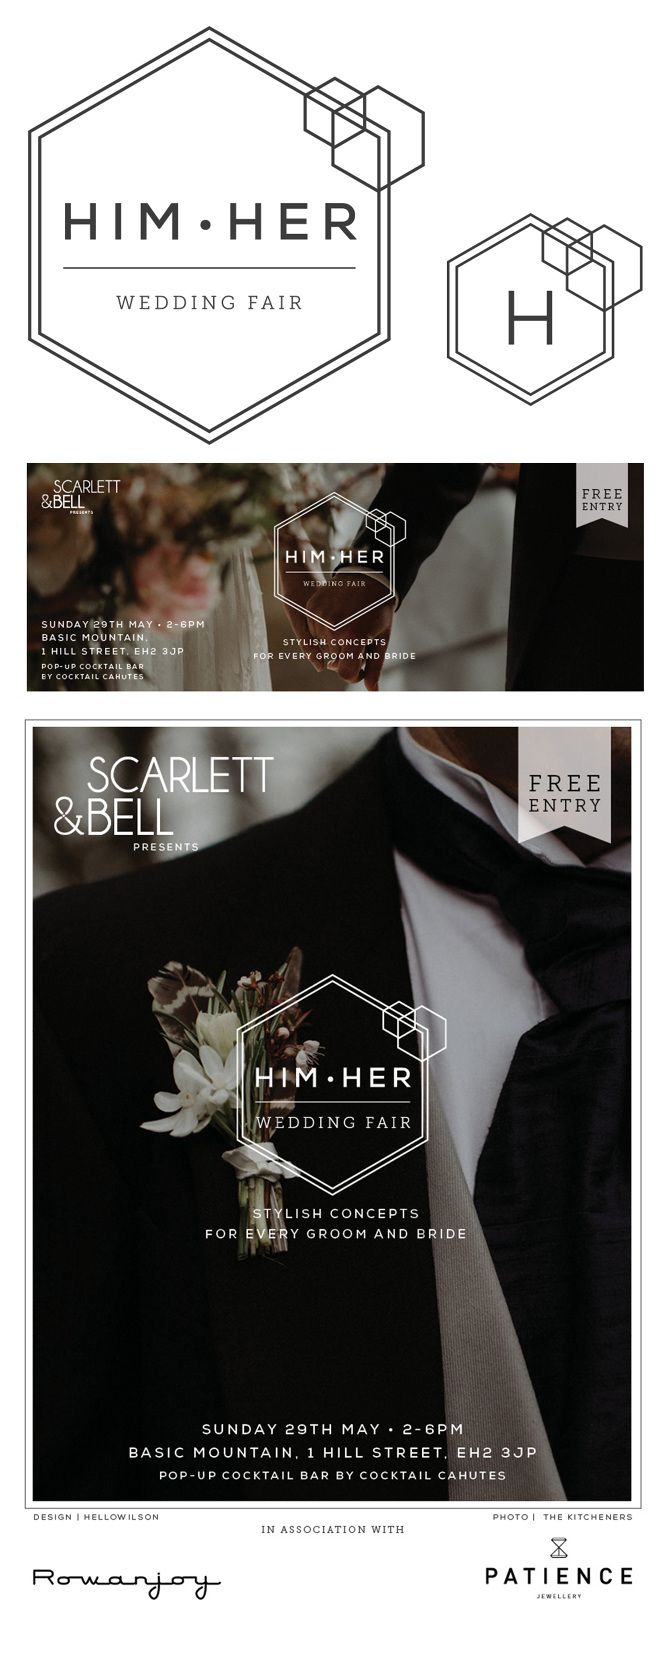 Branding: Him•Her Wedding Fair - Edinburgh Graphic Designer | Branding design for small, creative businesses | Edinburgh and UK  Click to find out more  #edinburghgraphicdesigner #edinburghdesigner #graphicdesigner #smallbusinessdesign #femaleentrepreneur #smallbusiness #creativebusiness #edinburghcreative #branding #identity #design #brandingdesign